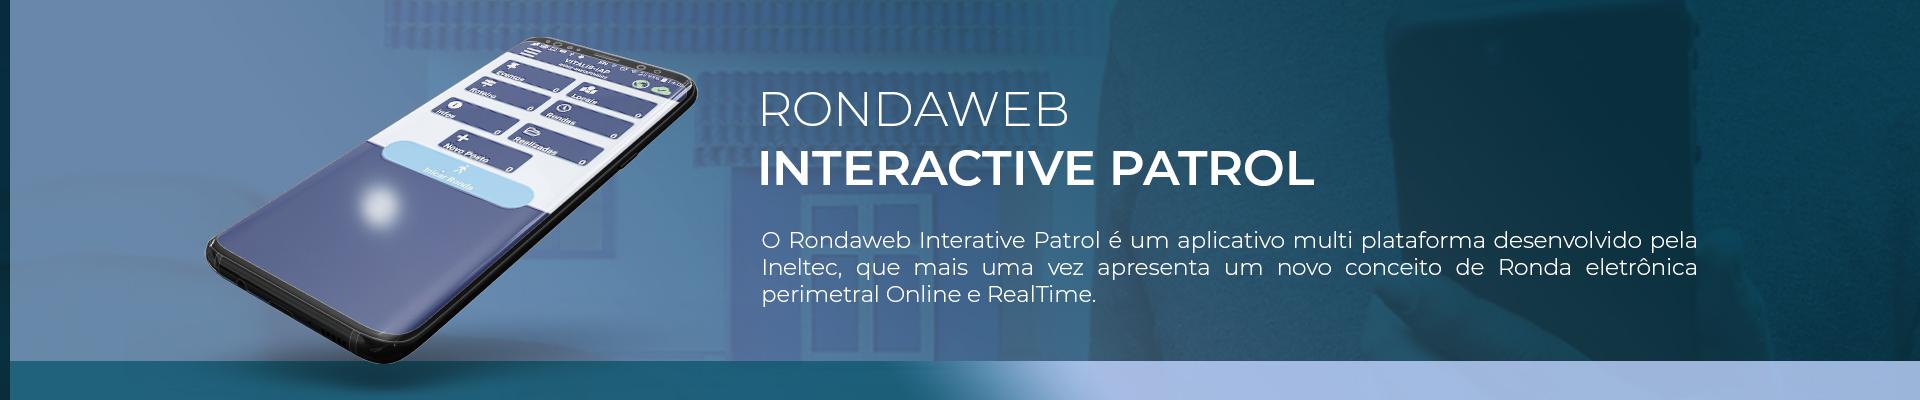 rondaweb interactive patrol